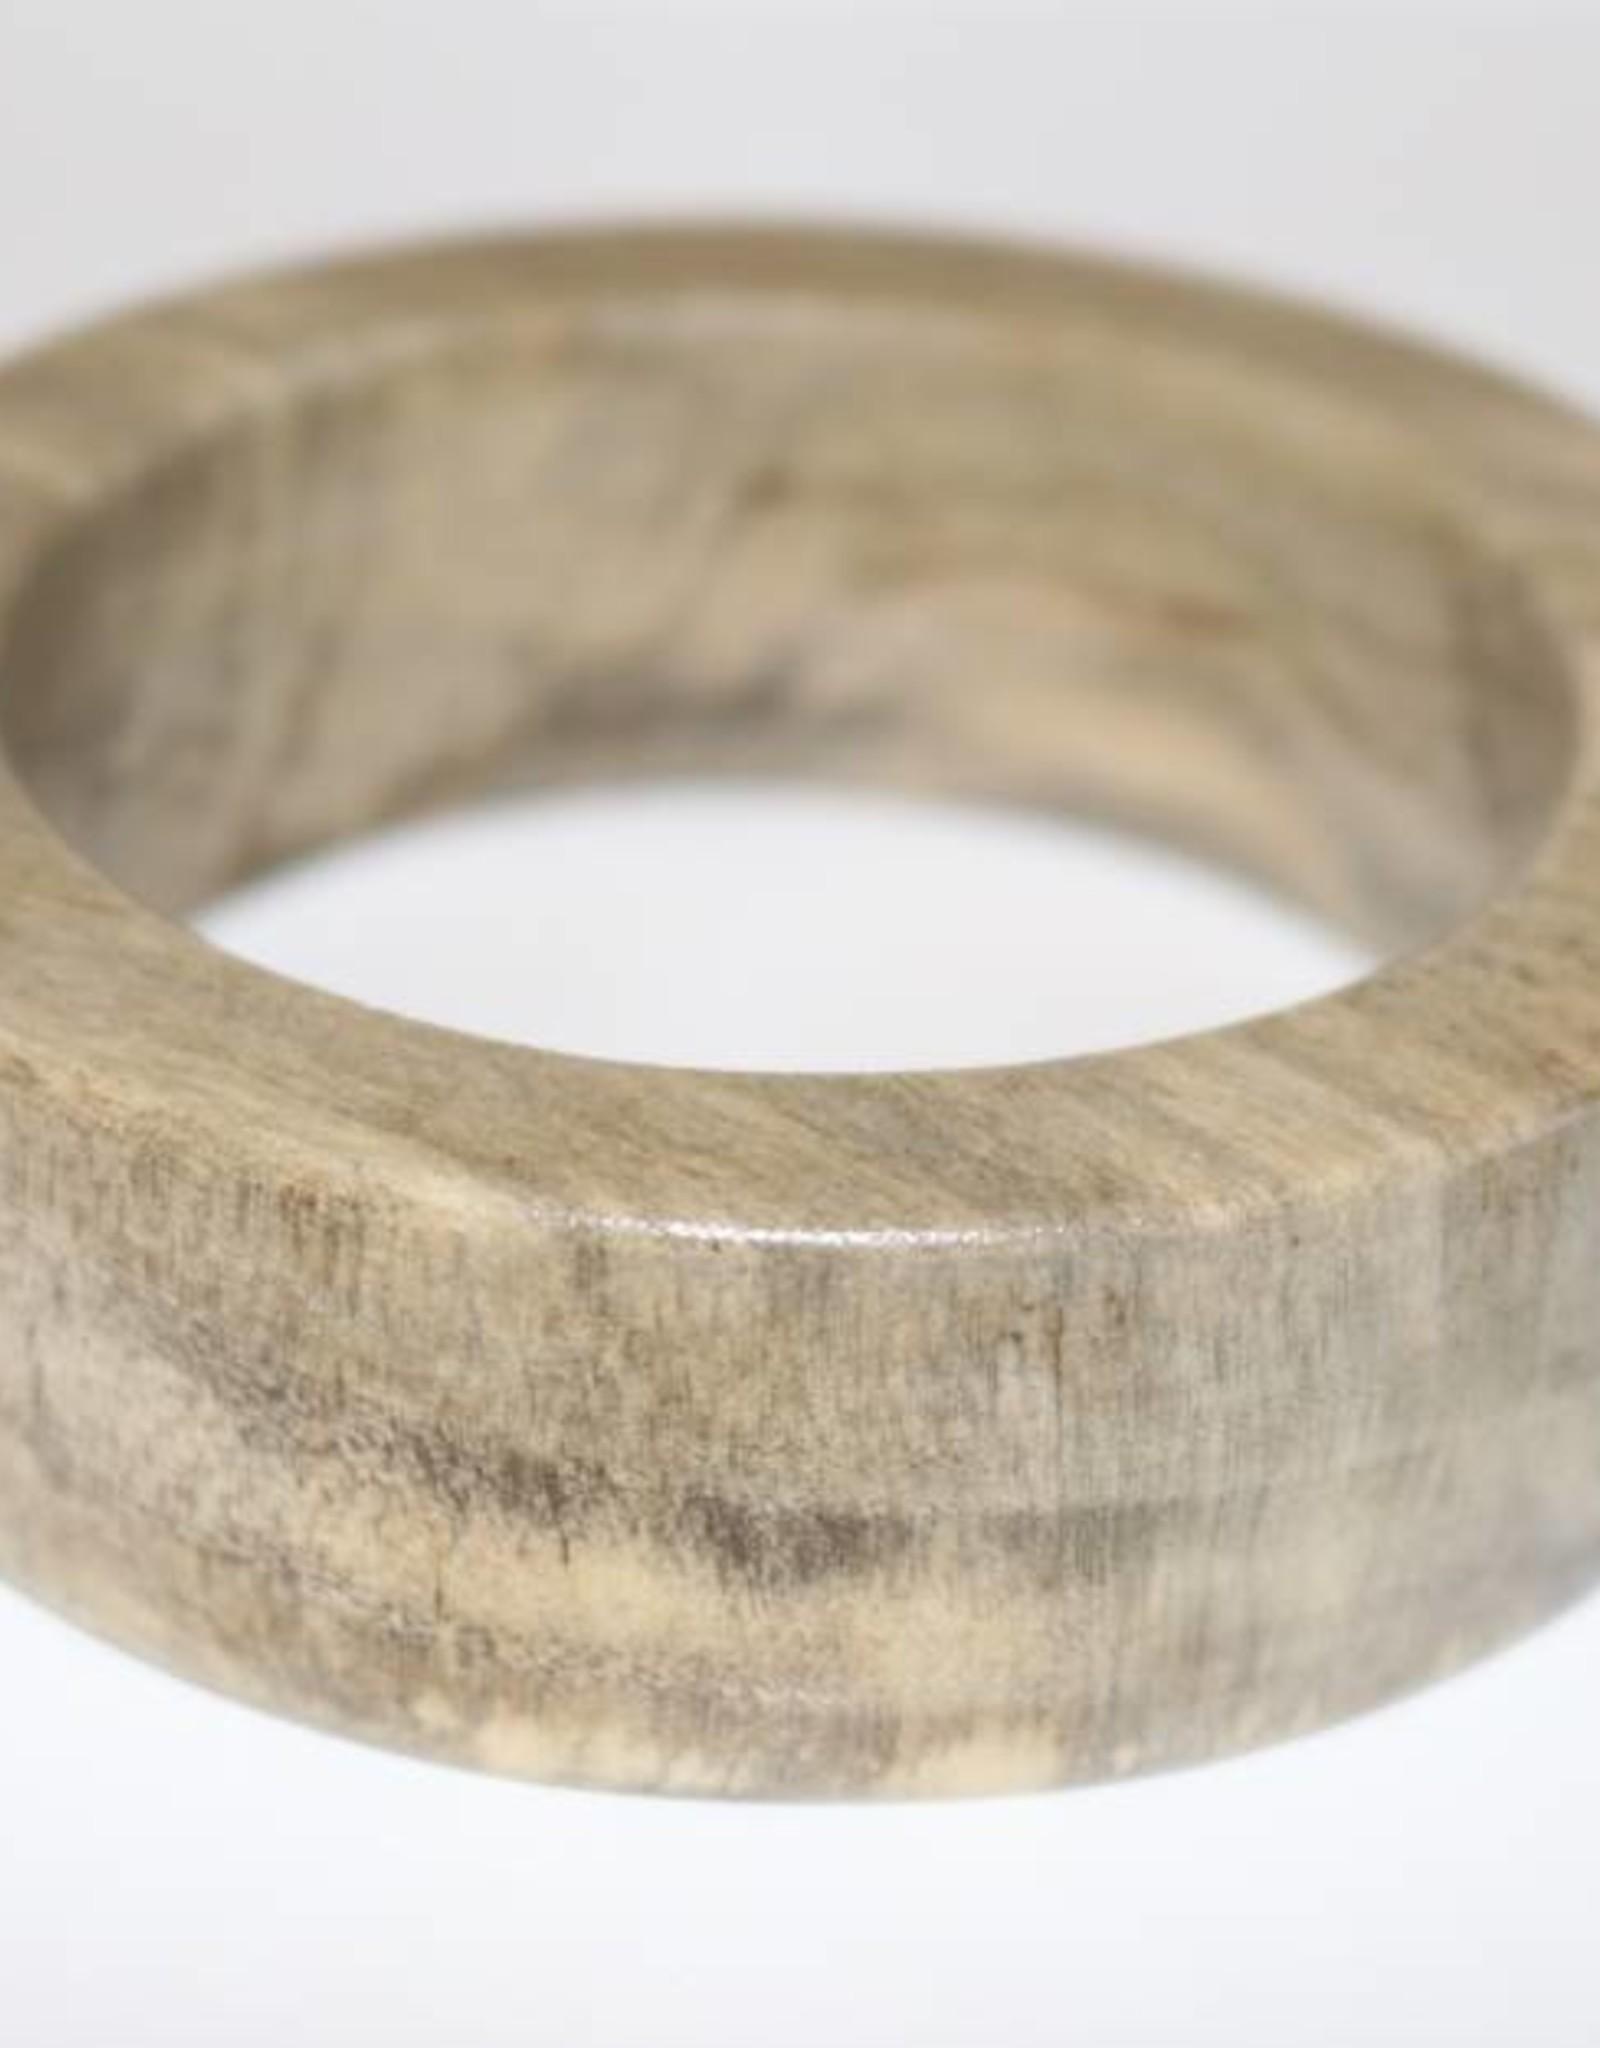 Claire Obeche Wood Bangle by Atelier Calla